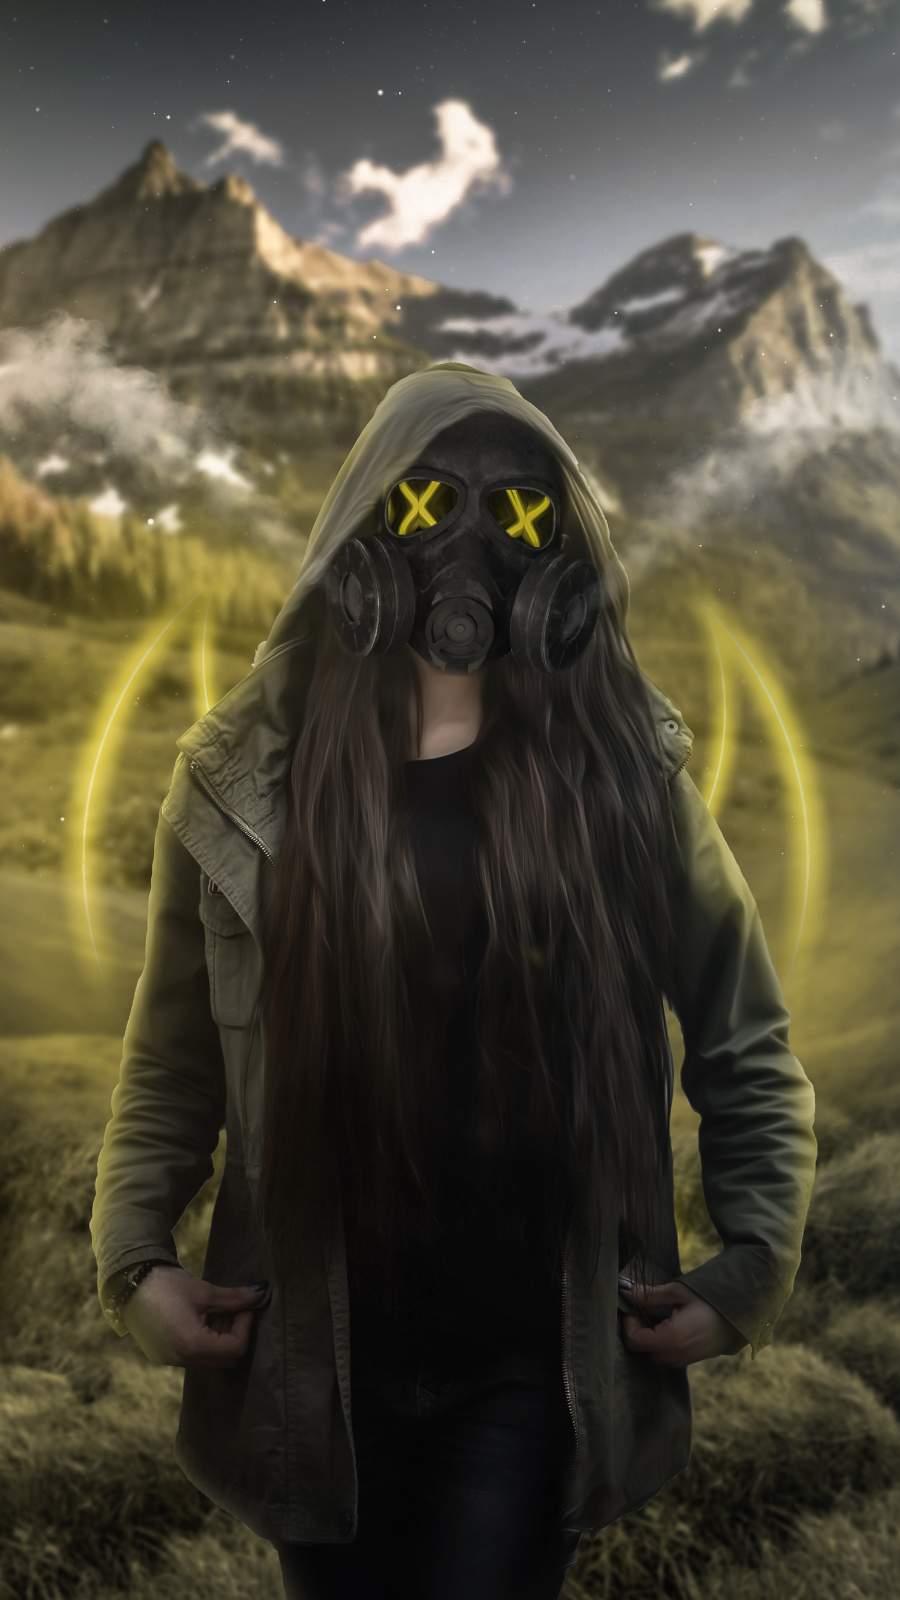 Poison Mask Girl iPhone Wallpaper